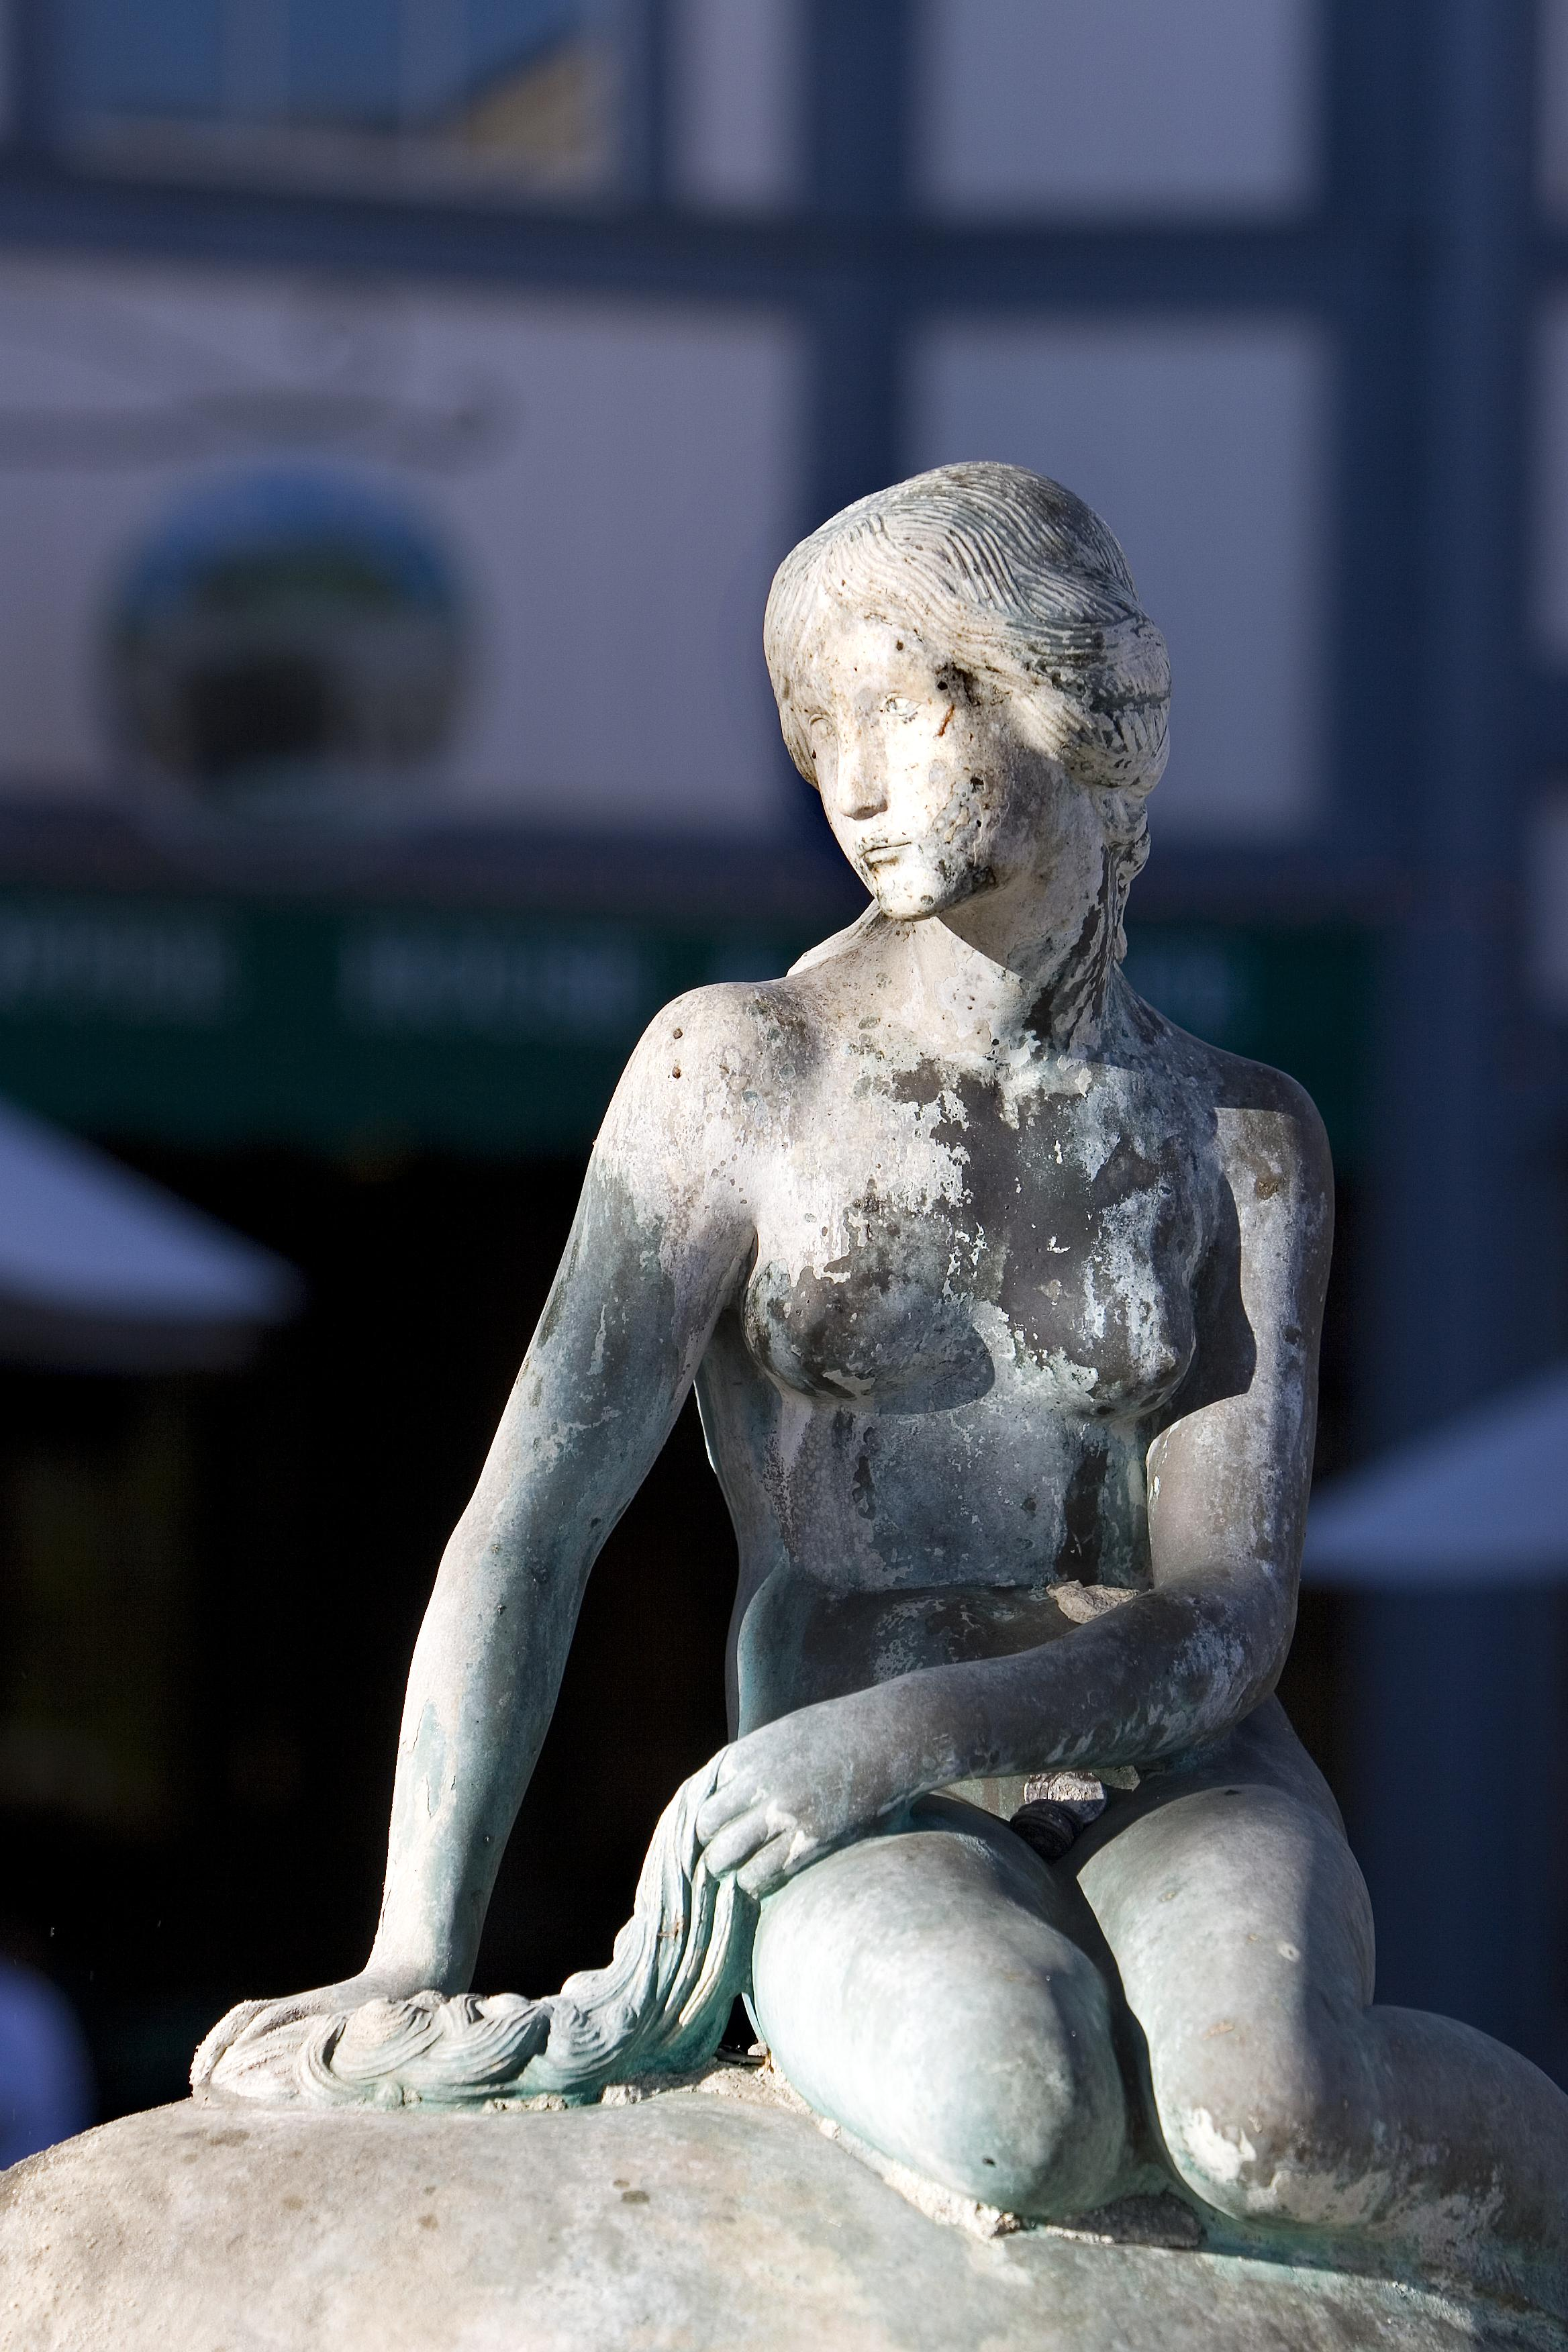 The Little Mermaid statue in Solvang